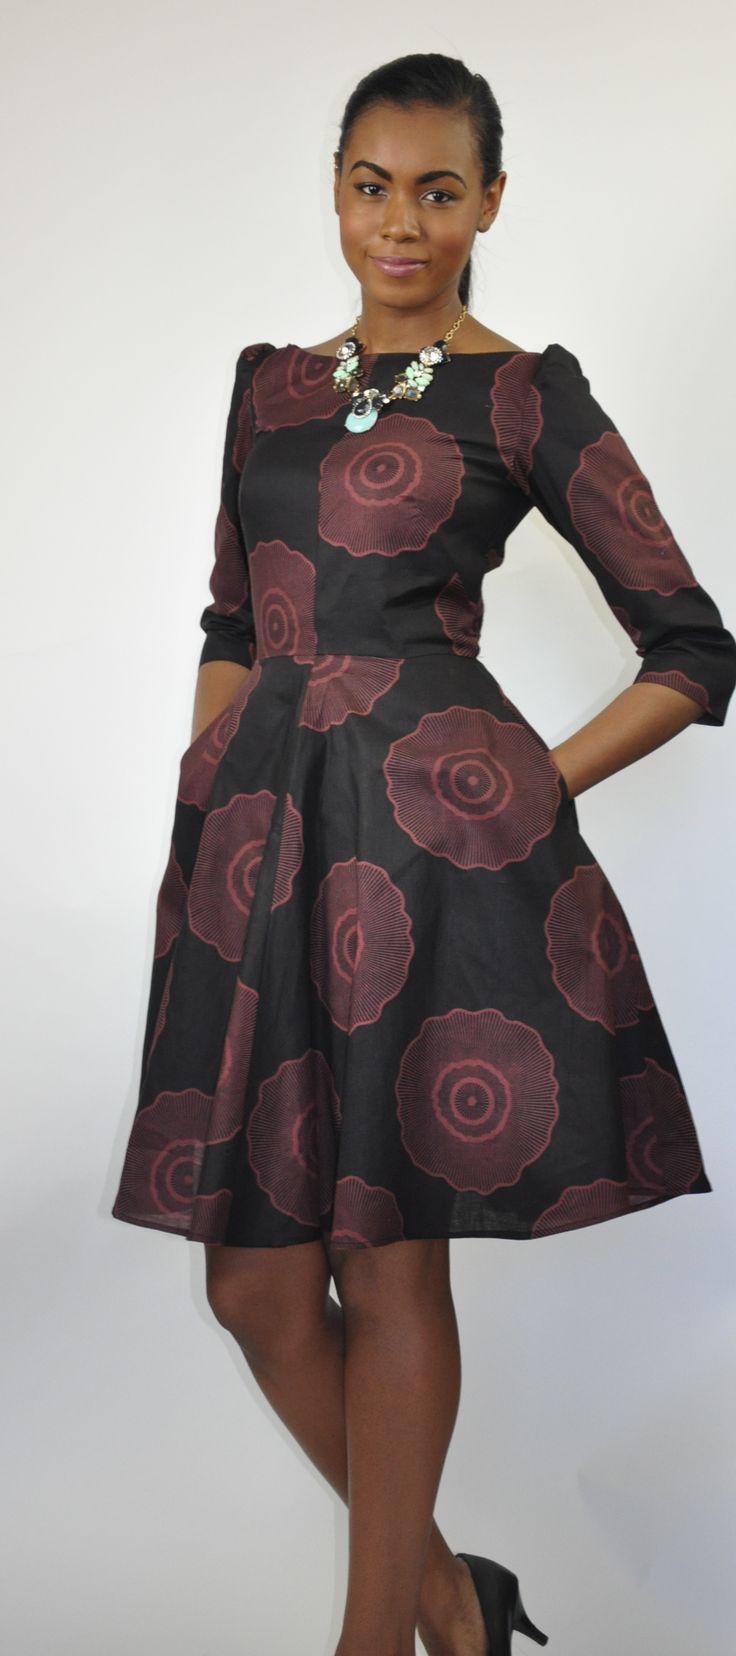 Jackie O Dress African Print Dress ~African fashion, Ankara, kitenge, African women dresses, African prints, African men's fashion, Nigerian style, Ghanaian fashion ~DKK